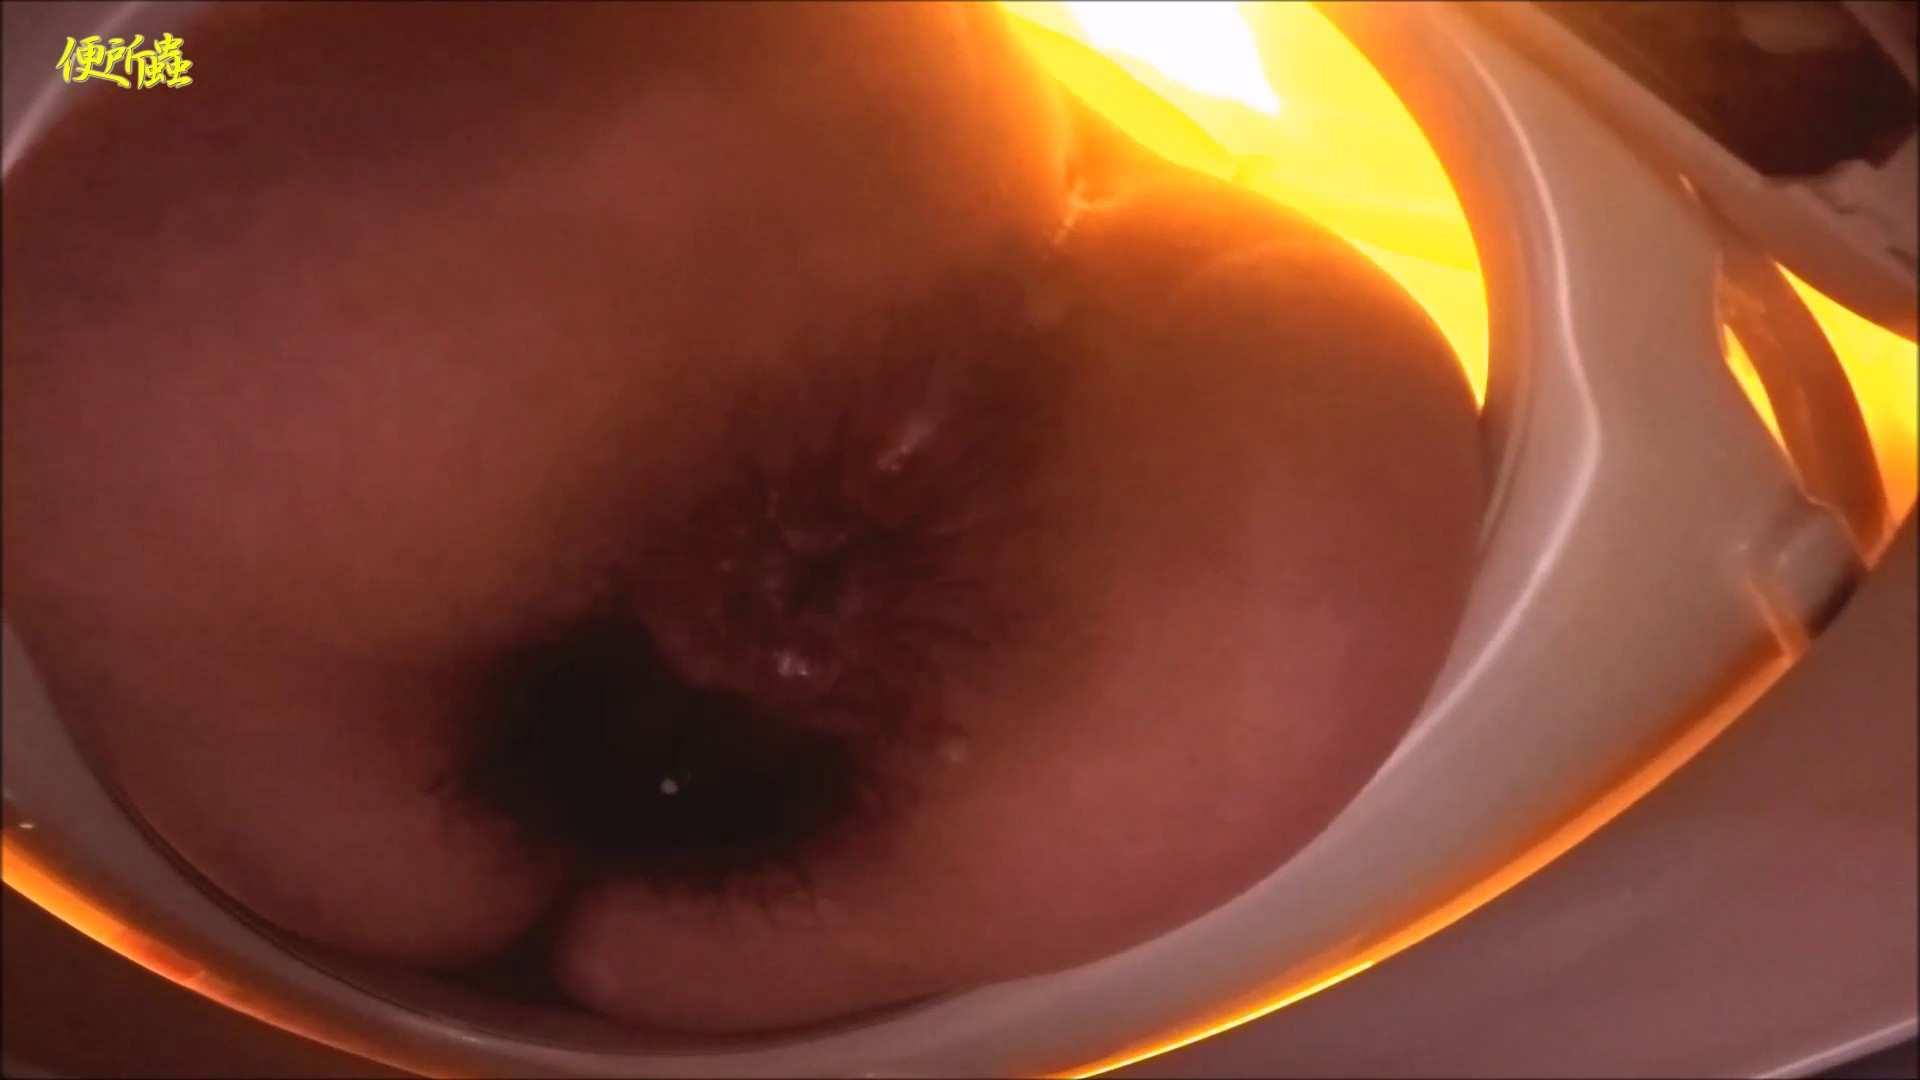 vol.08 便所蟲さんのリターン~寺子屋洗面所盗撮~ お姉さん攻略 ワレメ動画紹介 94画像 20